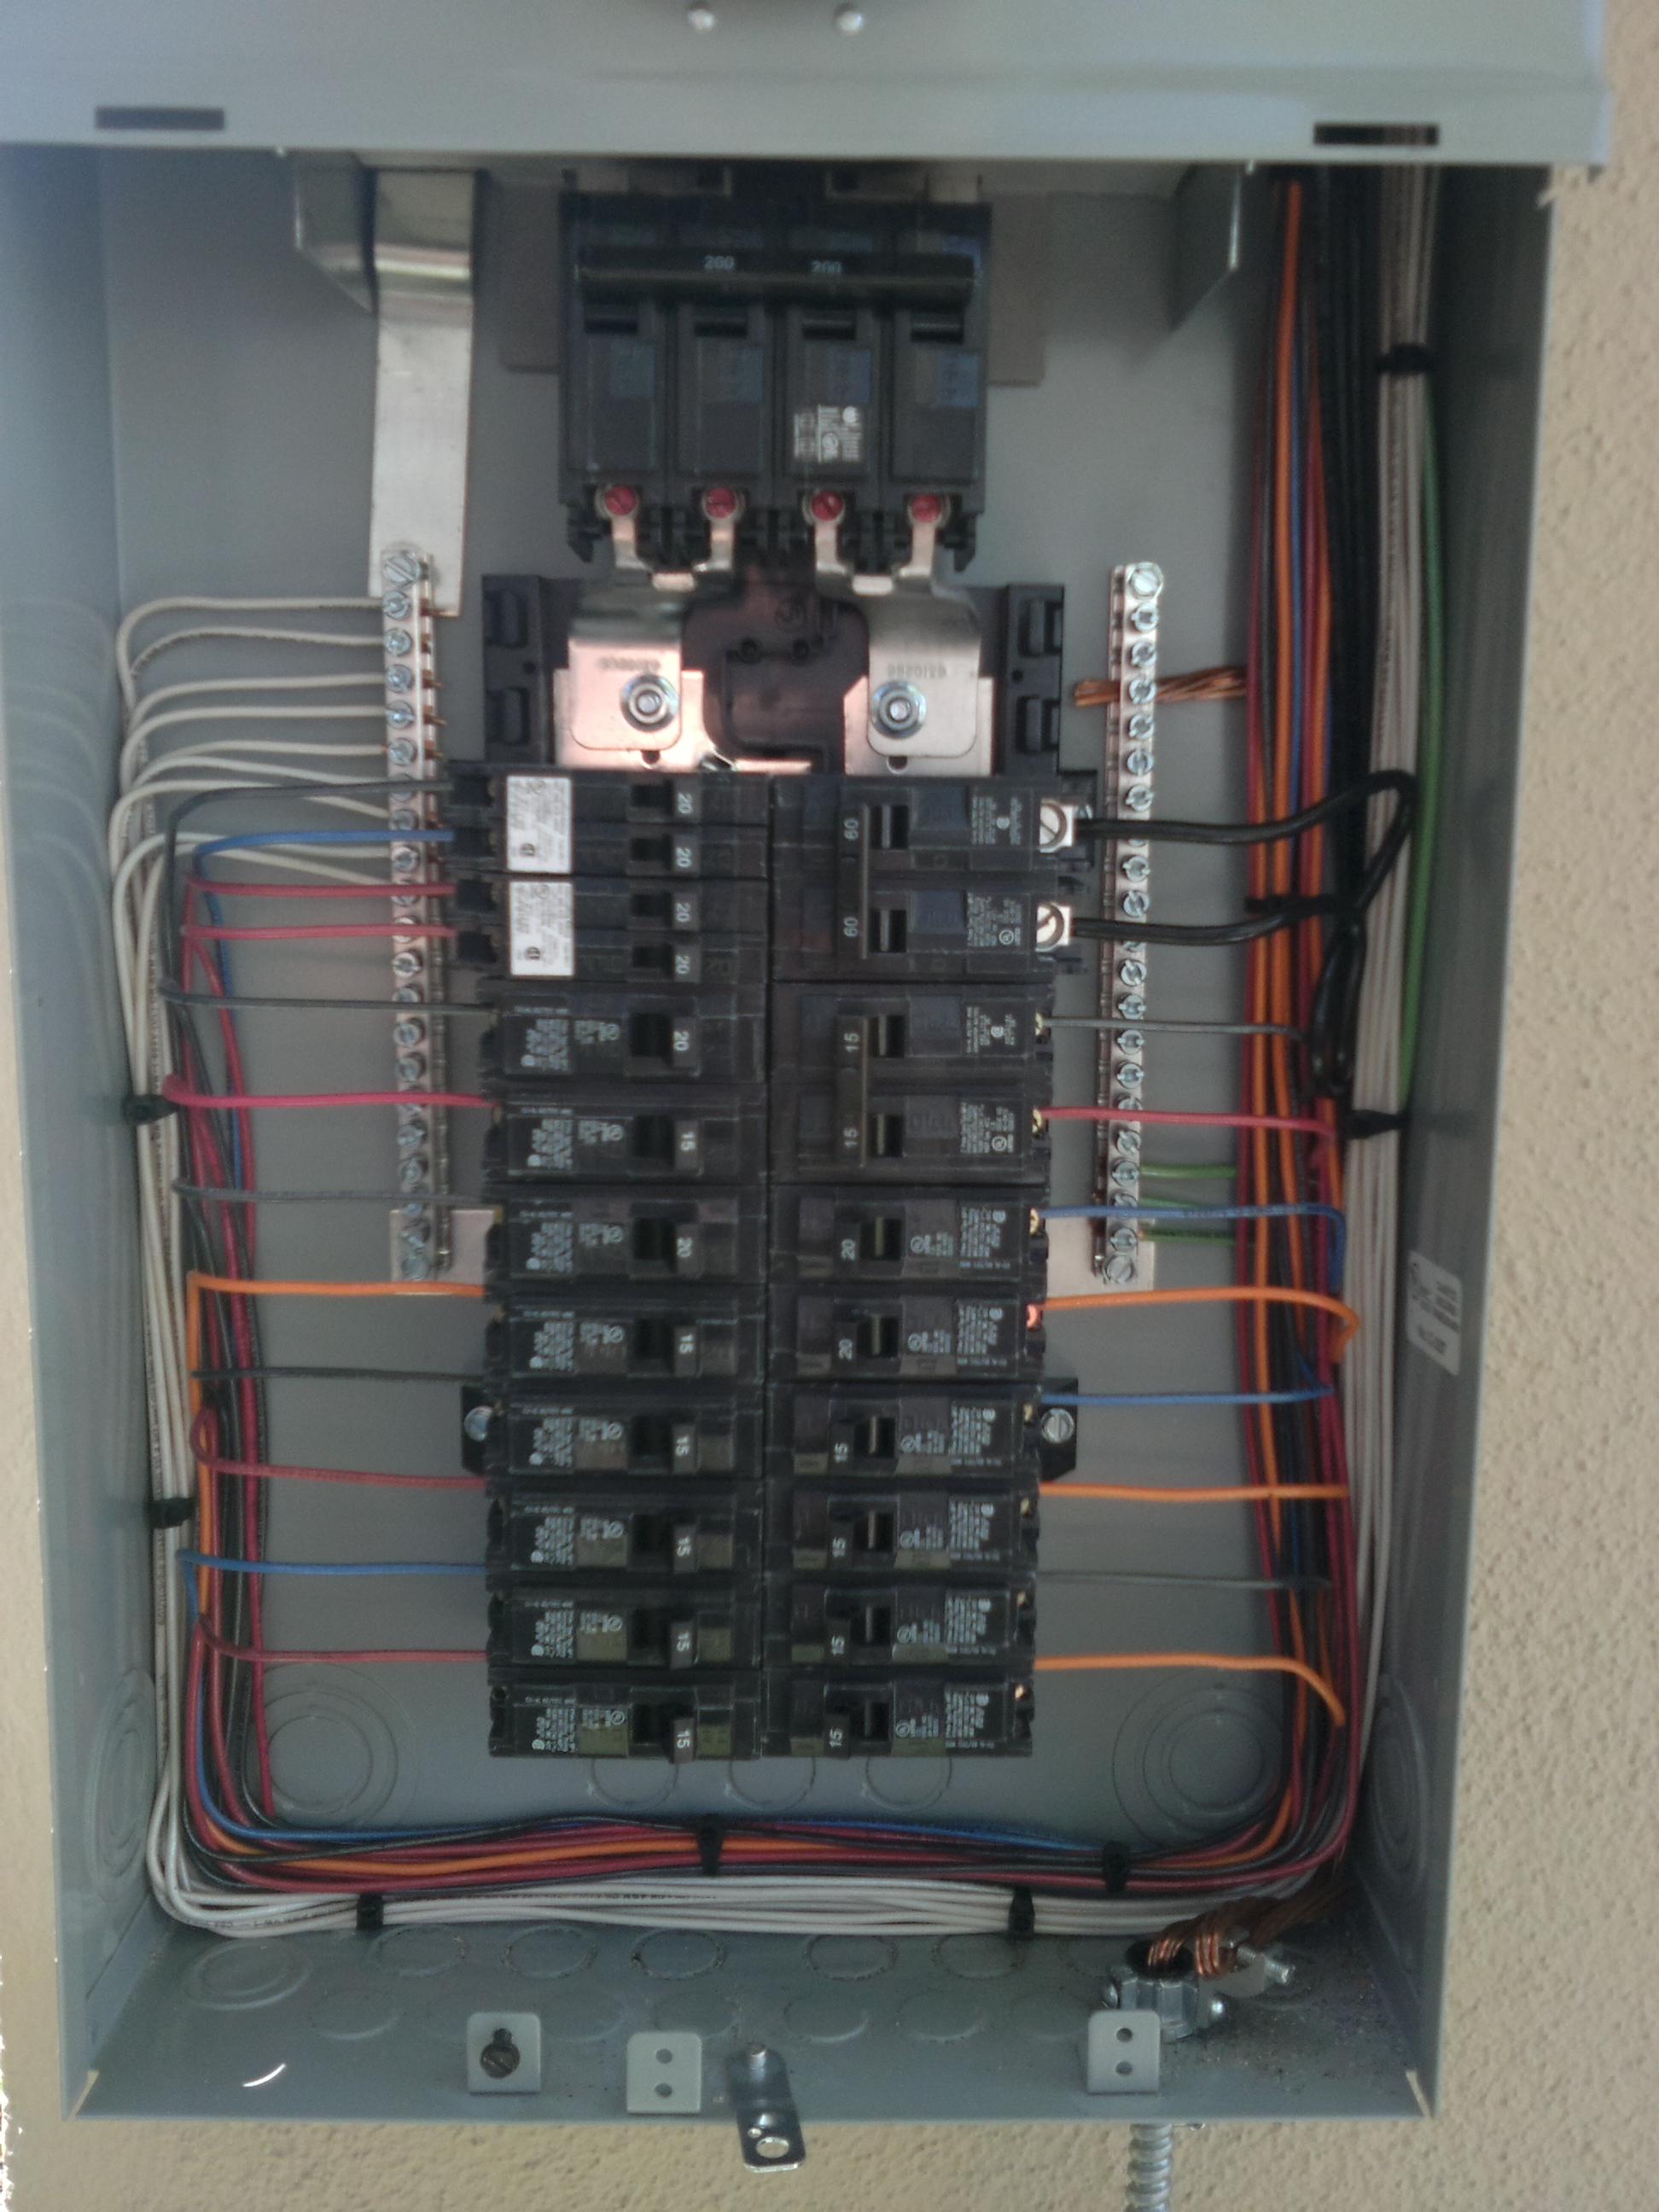 A Diy Problem We Often Find In Circuit Panel Wiring Kilowatt